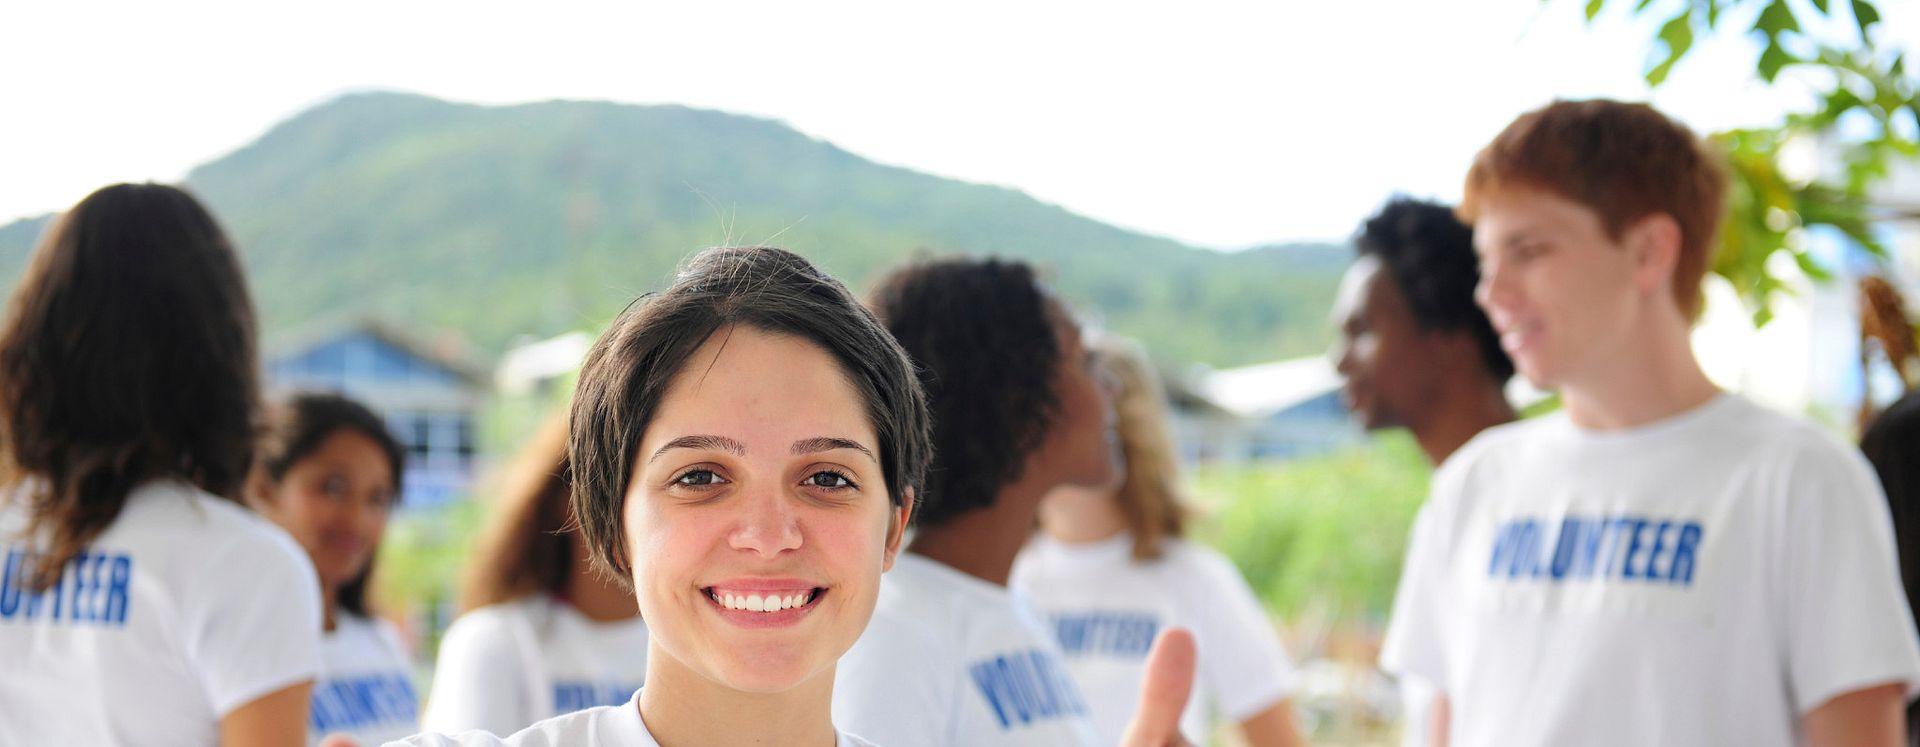 Girl volunteer showing thumbs up